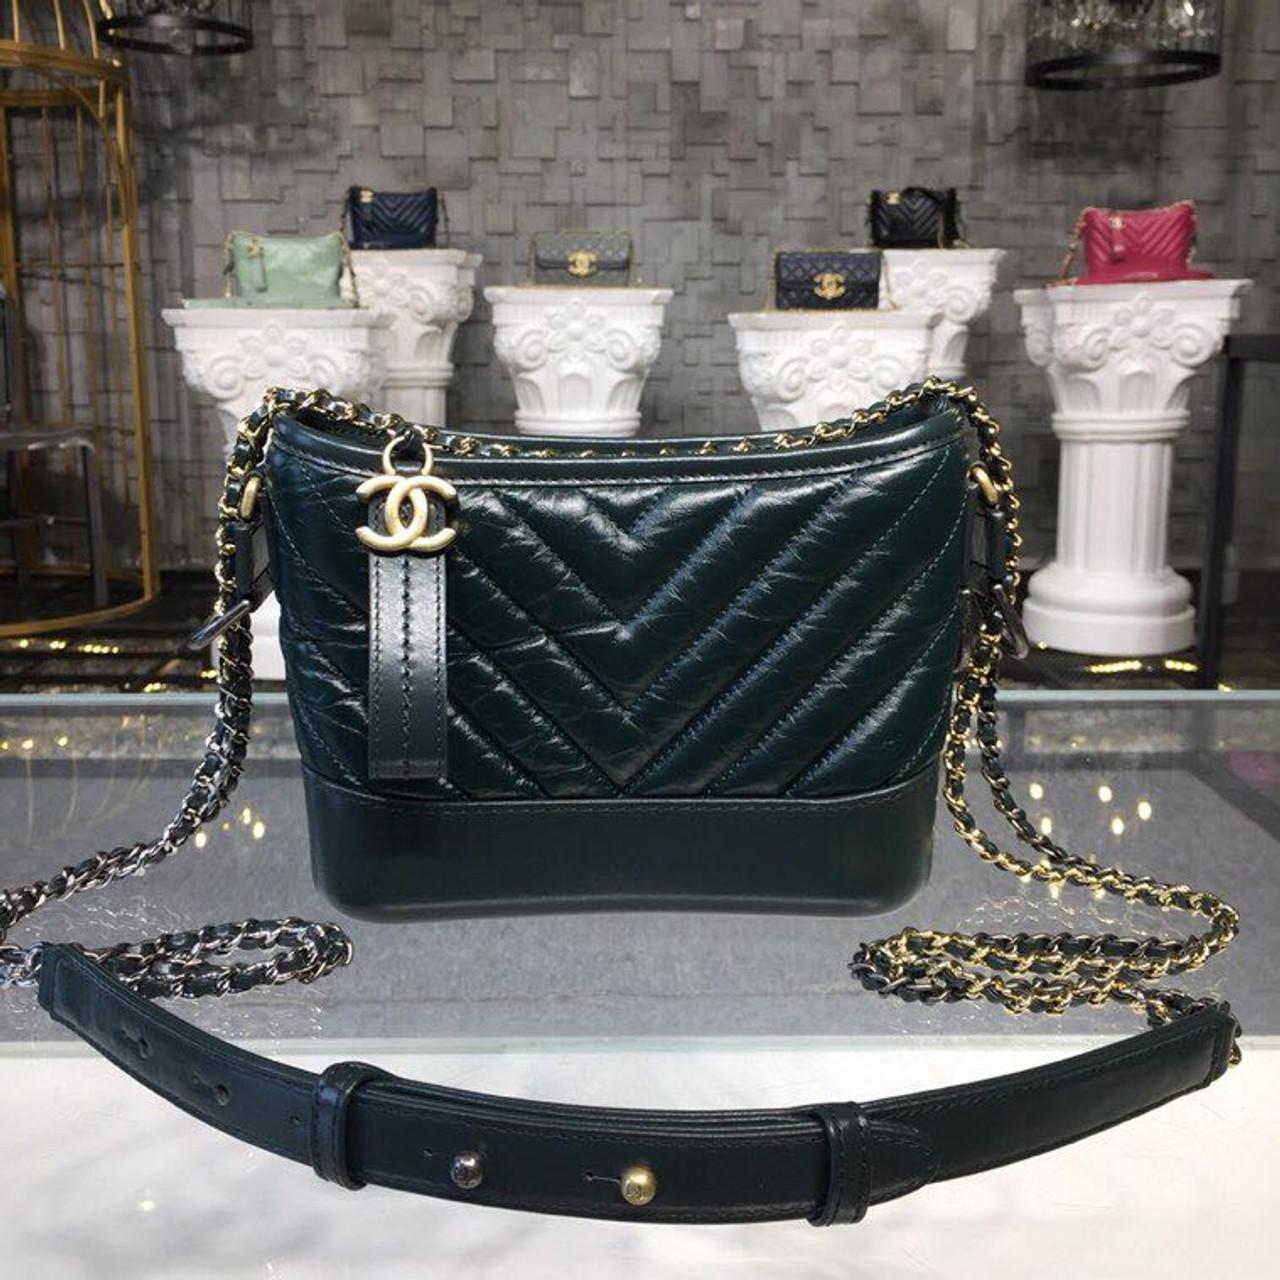 c97ffc8d72cf Chanel Gabrielle Chevron Hobo Bag Small 20cm Aged Calfskin Leather  Fall/Winter 2018 Act 1